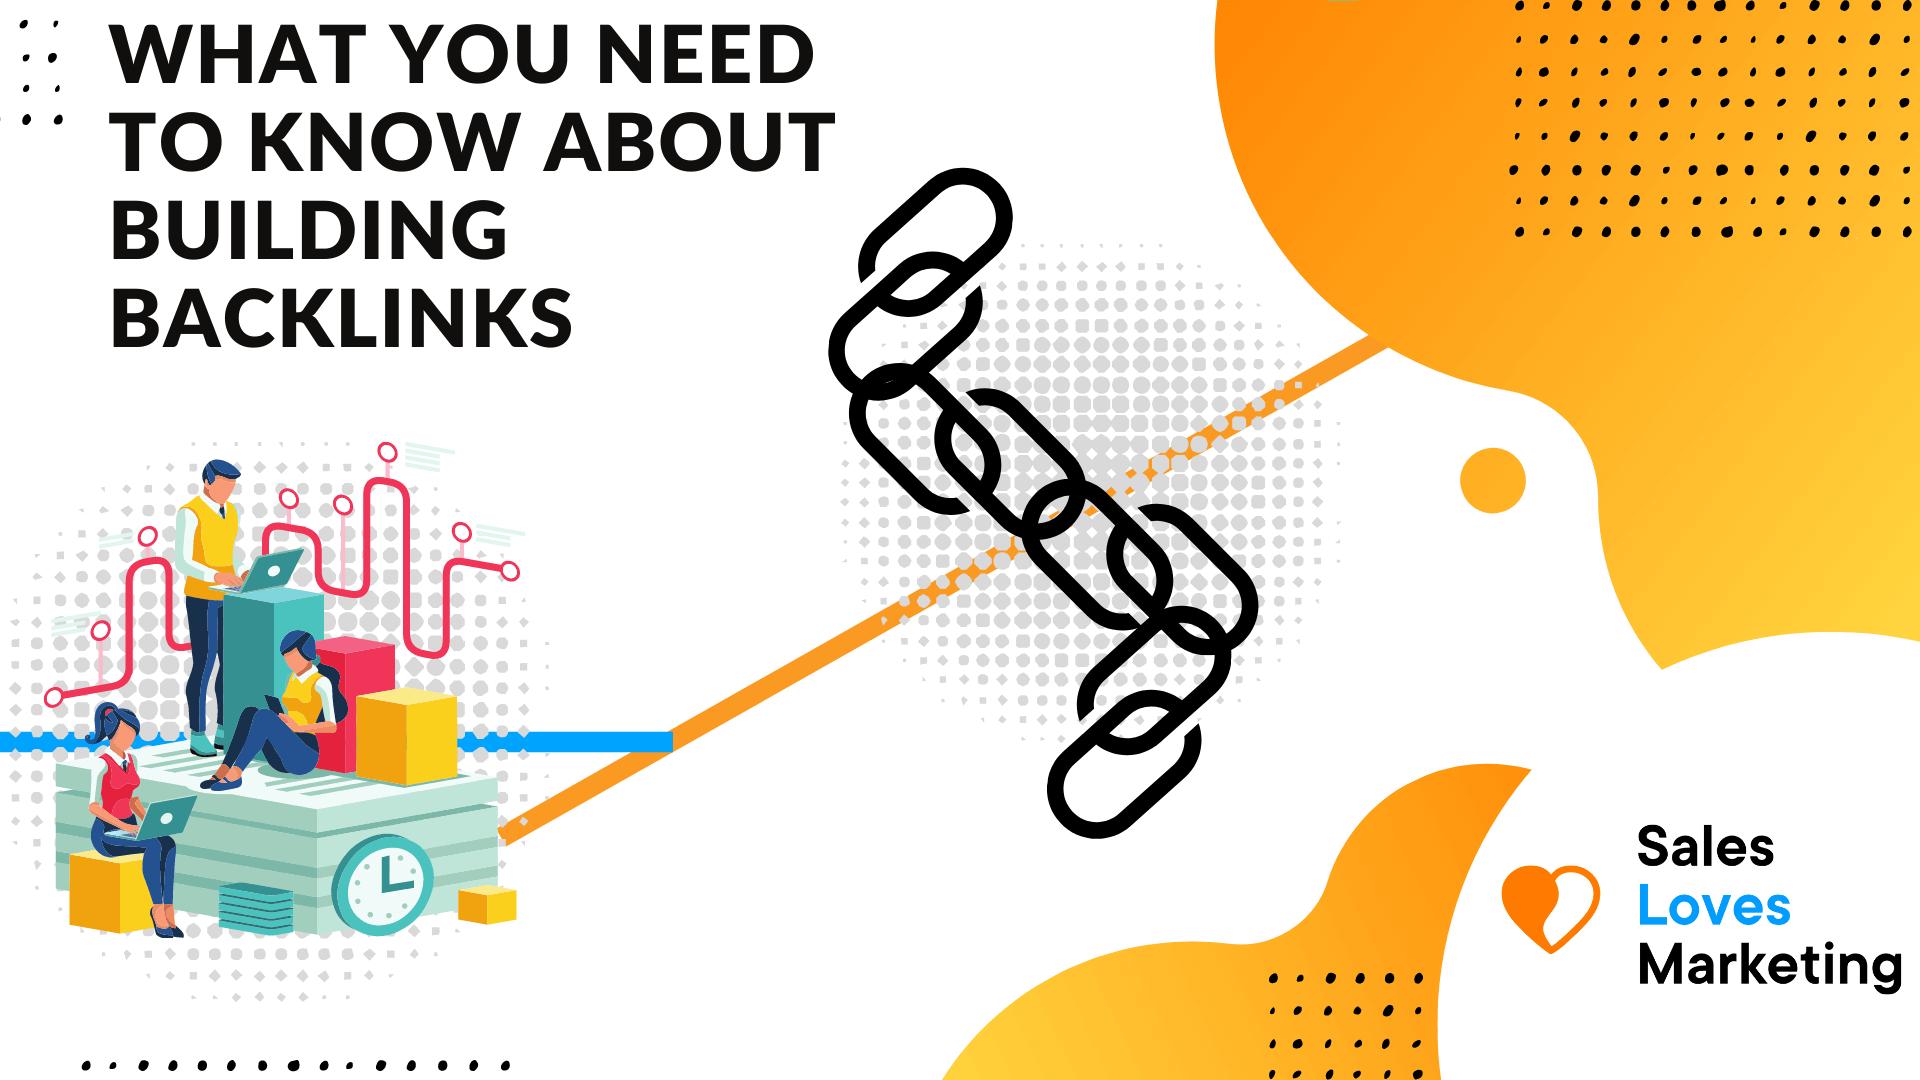 building backlinks for SEO